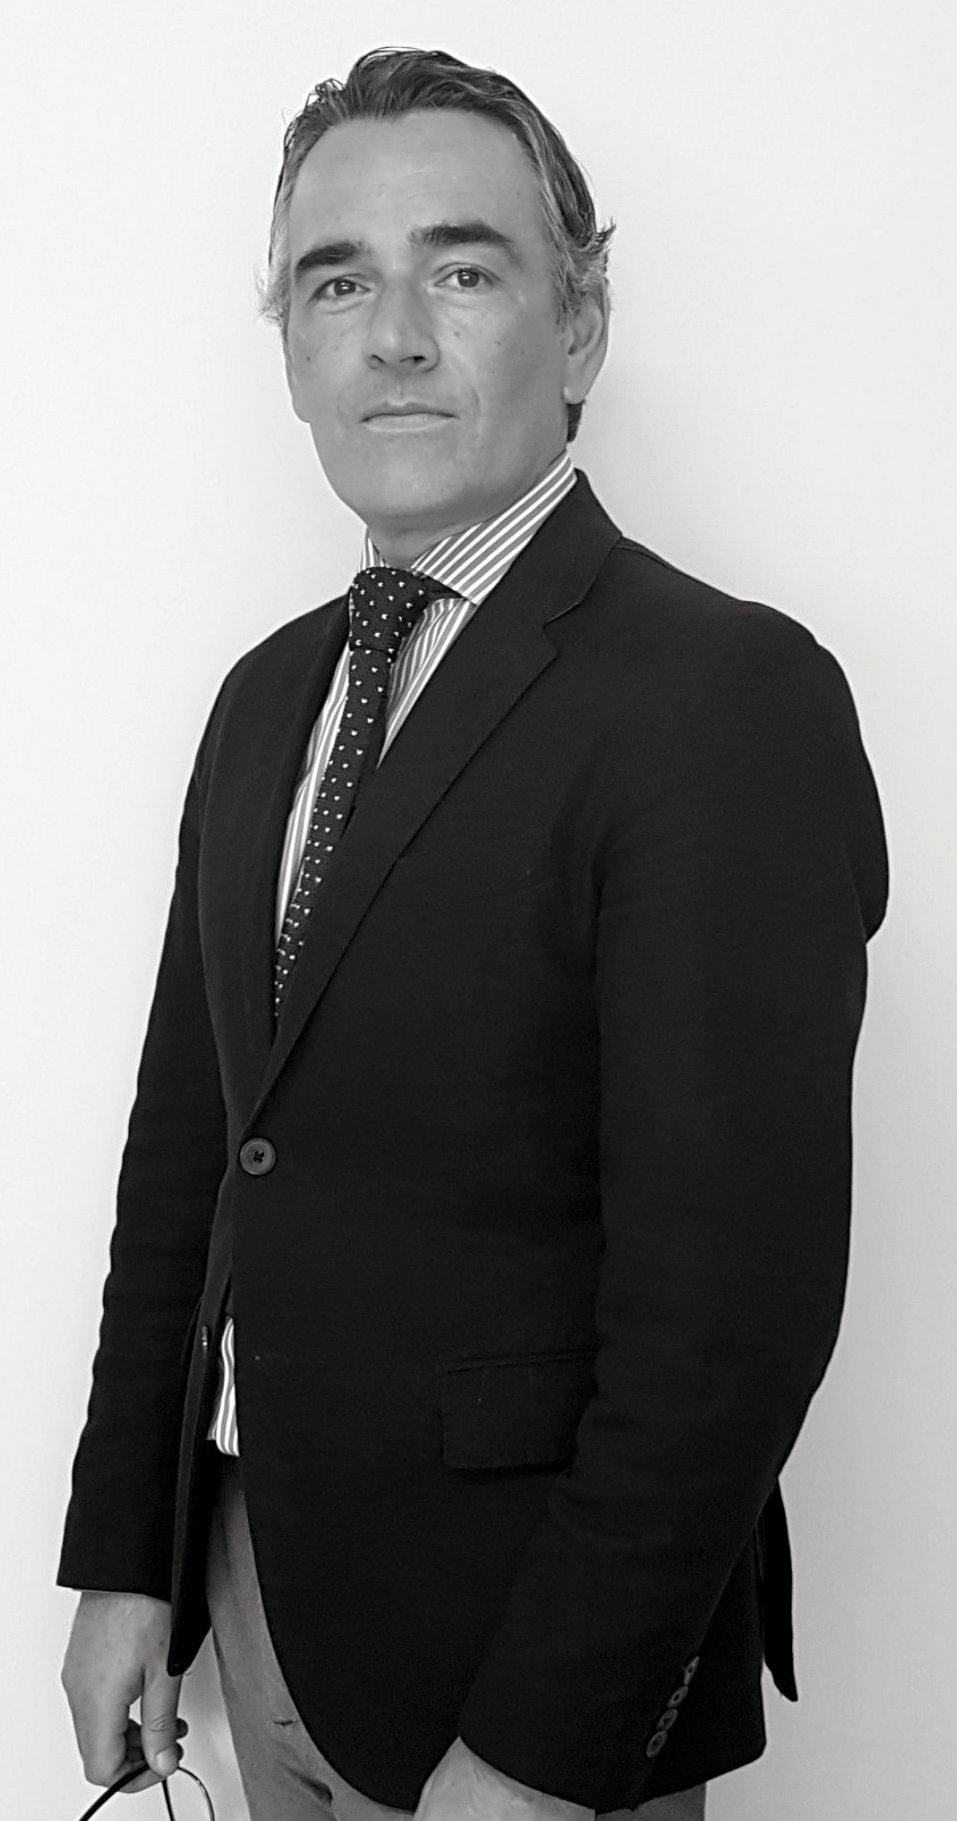 Óscar Pérez Nuñez